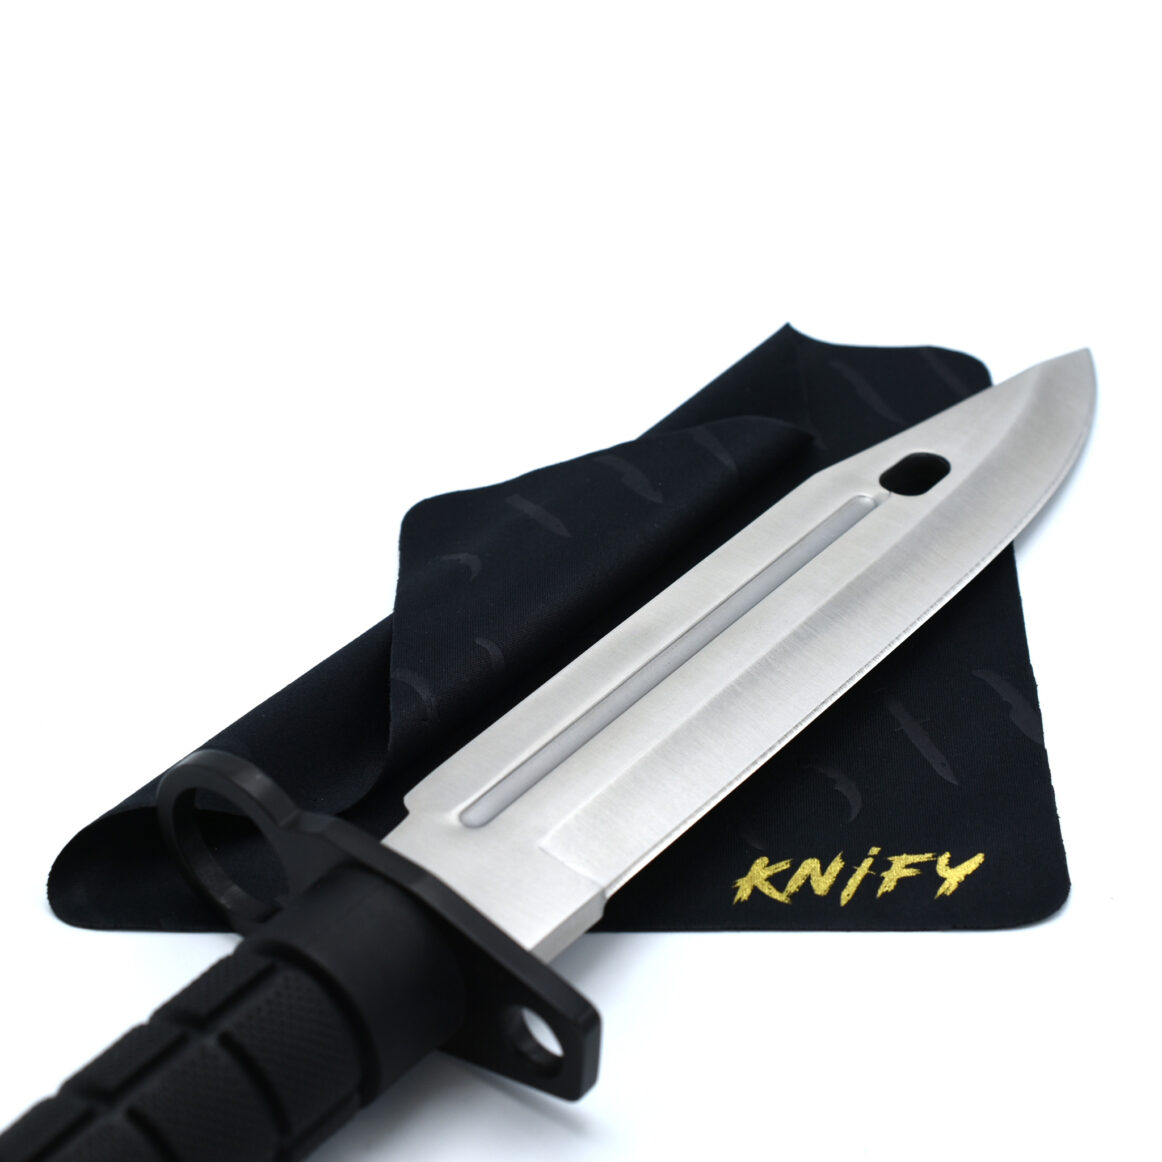 Real CS:GO Bayonnet Vanilla - IRL CS GO Knife